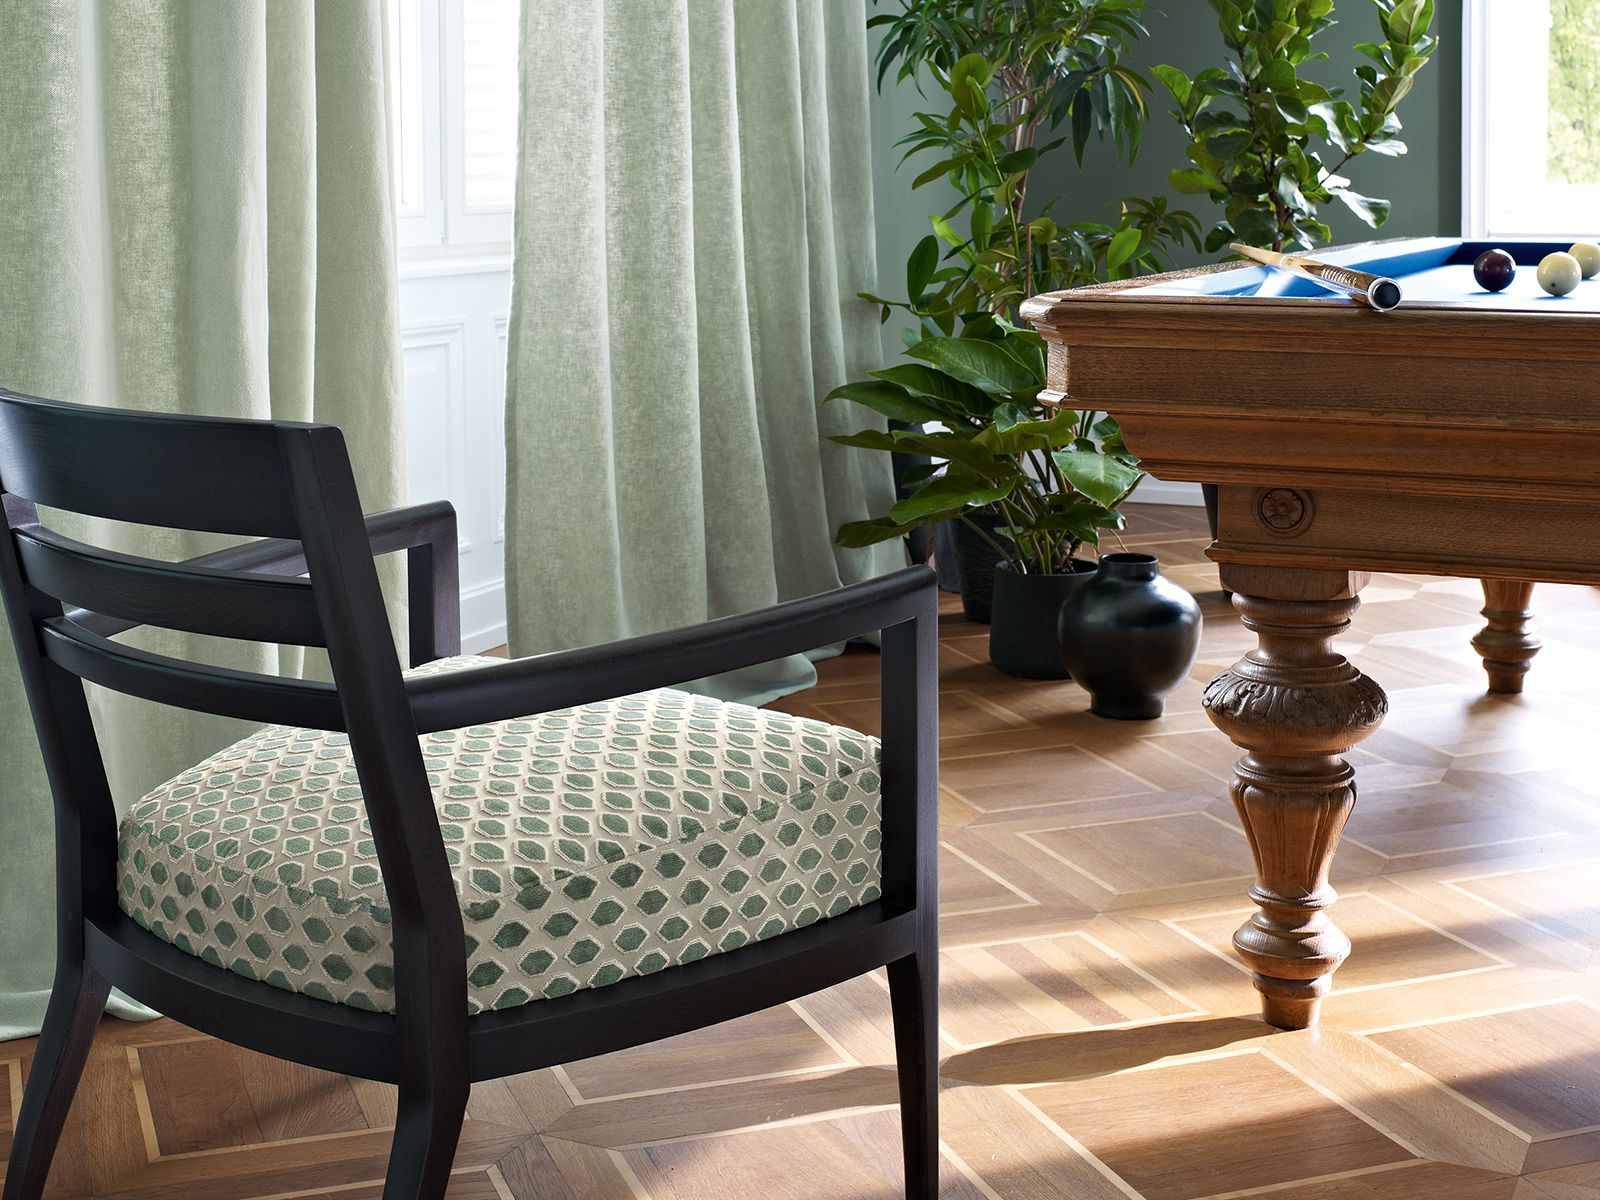 Zimmer + Rohde, living room, Wohnzimmer, Sessel, armchair ...